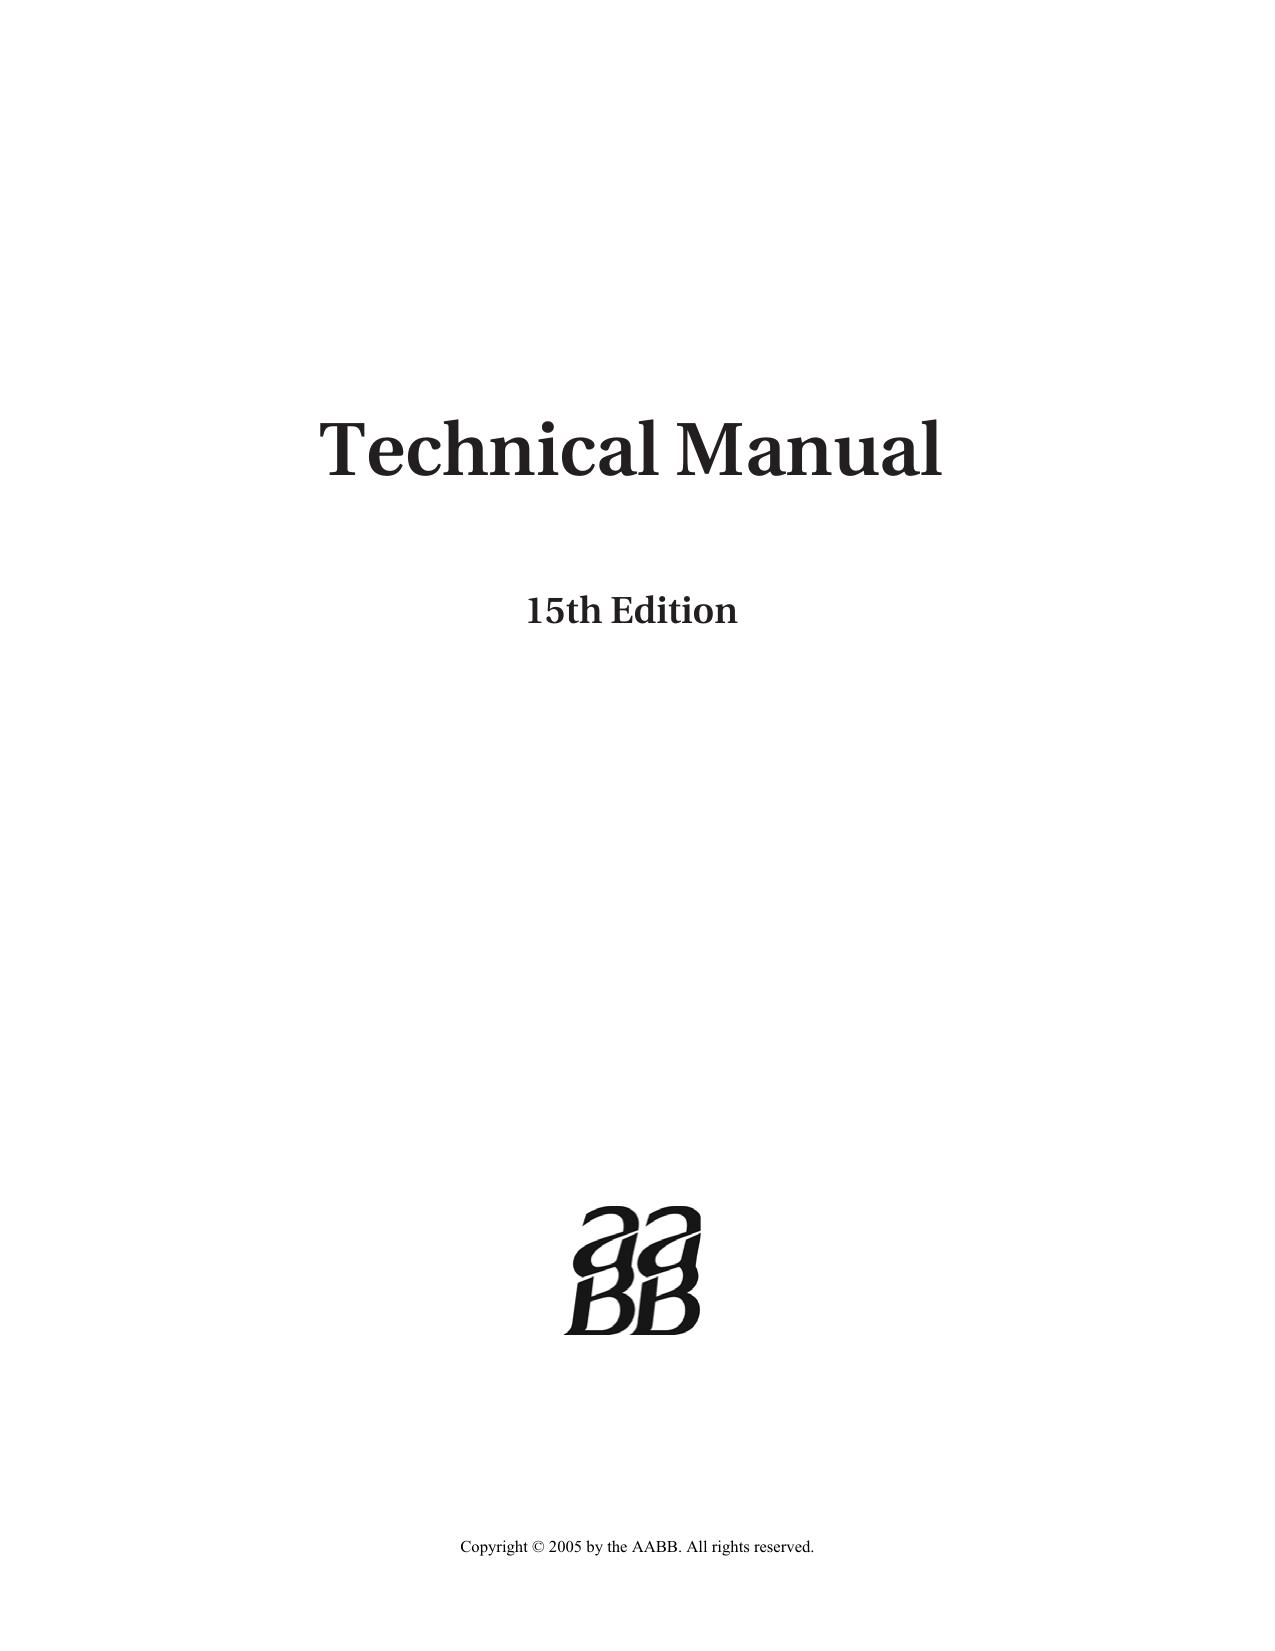 aabb technical manual 15th ed 2005 manualzz com rh manualzz com AABB Technical Manual Purple aabb technical manual 16th edition pdf